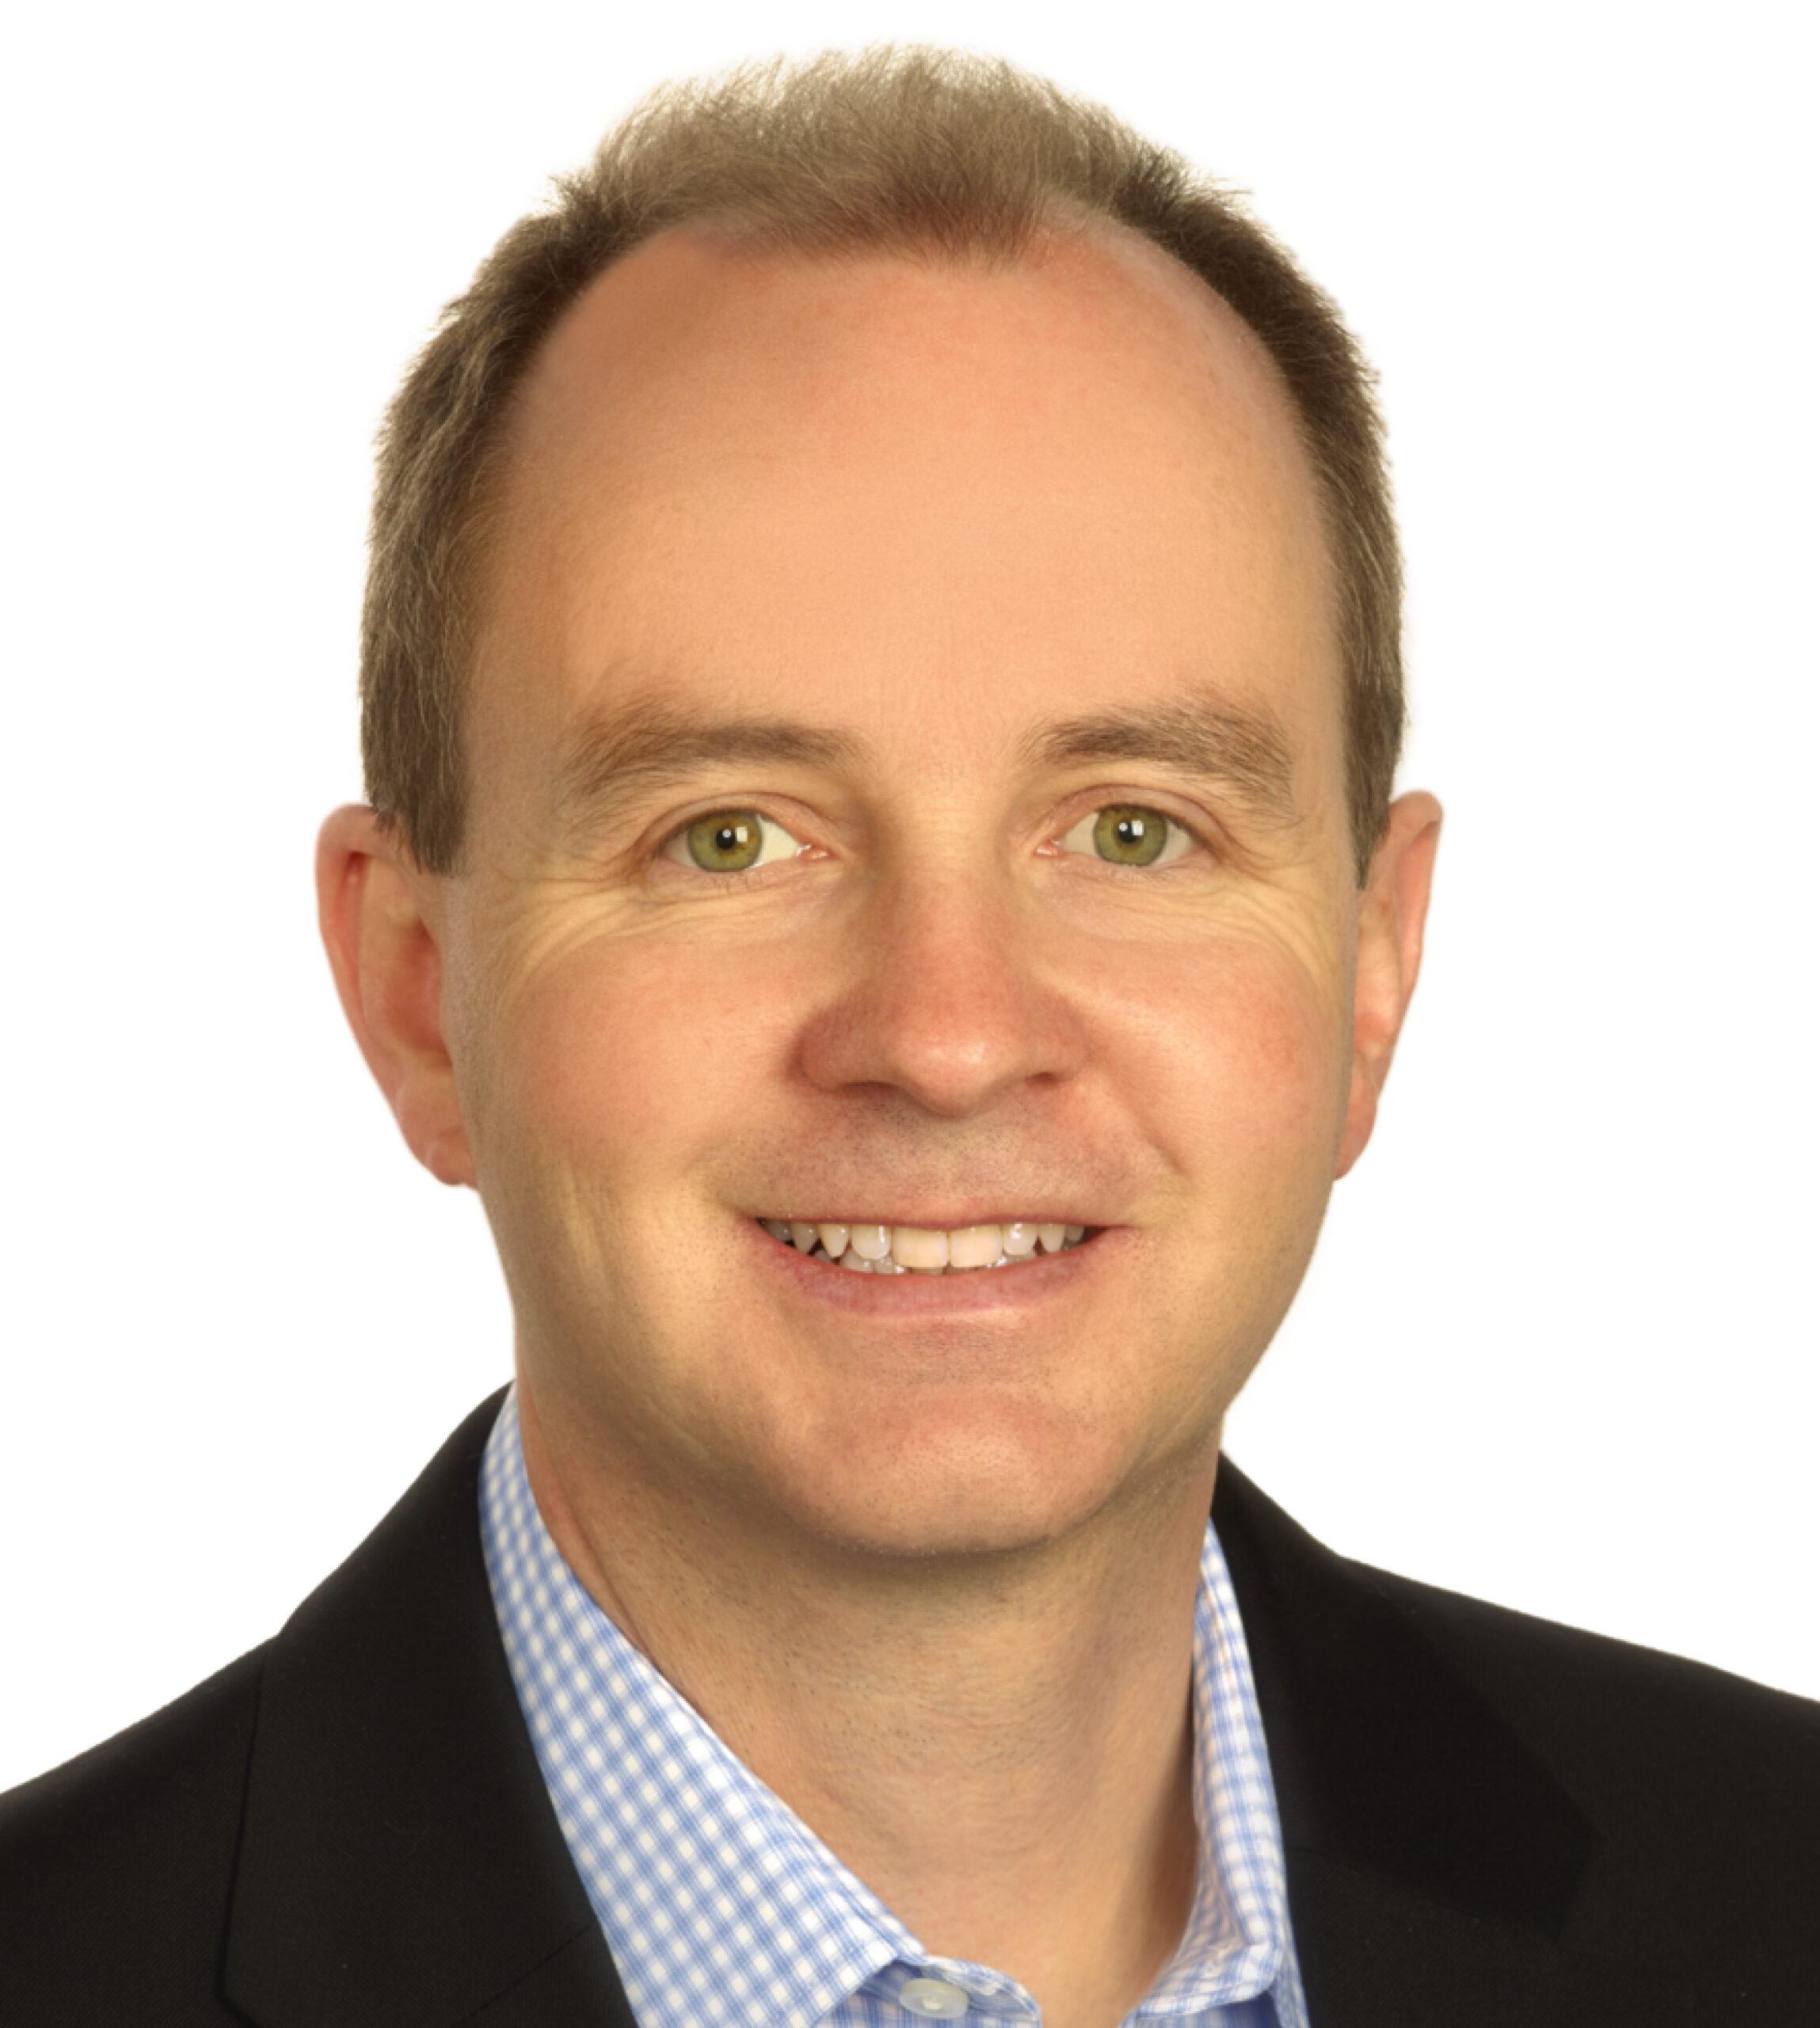 Martin Devenney, PhD